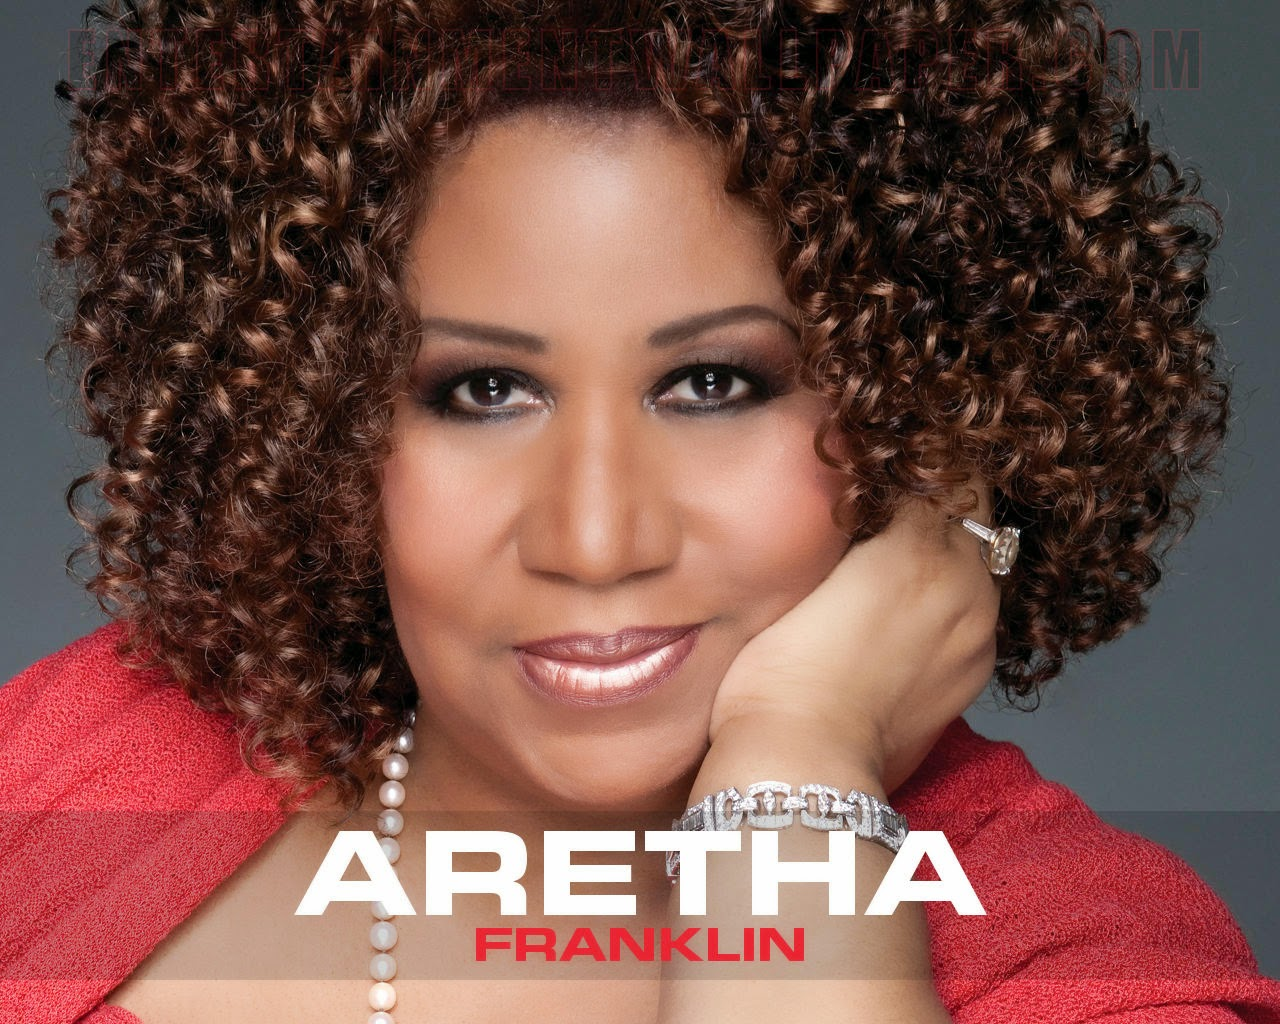 Aretha Franklin regrava Adele,Chaka Khan,Alicia Keys e outras